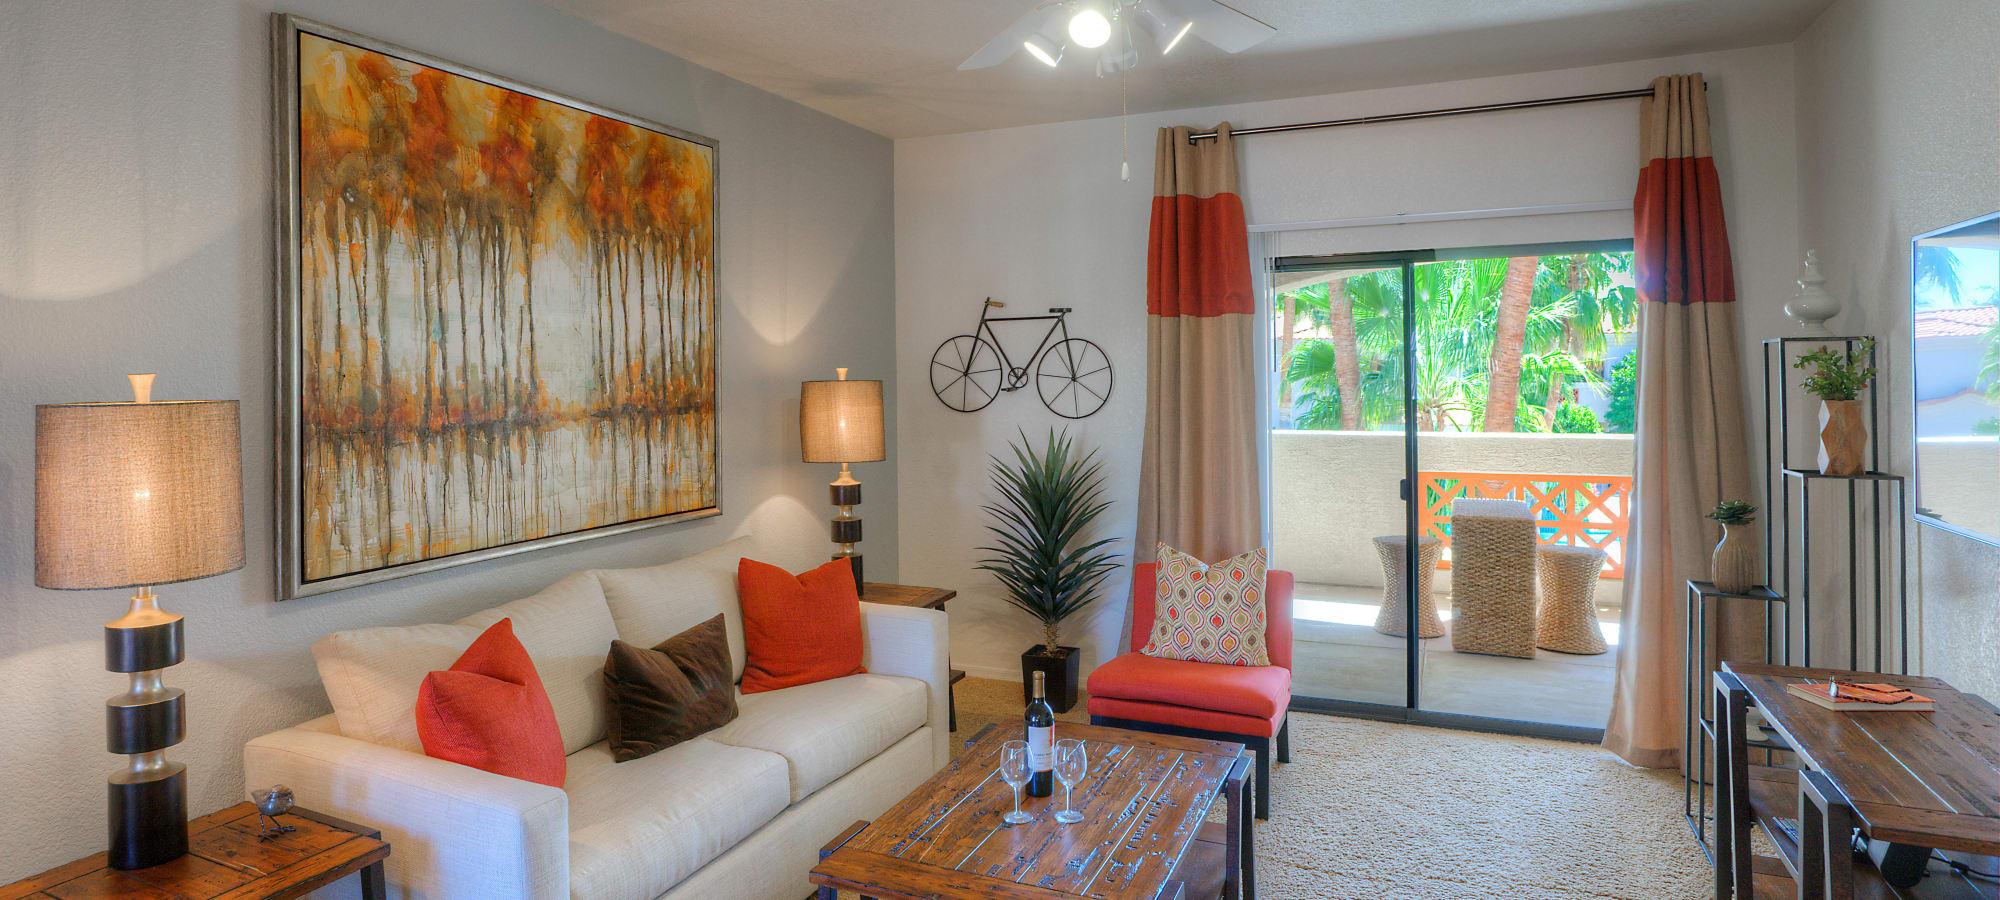 Model living room featuring sliding glass door at San Prado in Glendale, Arizona